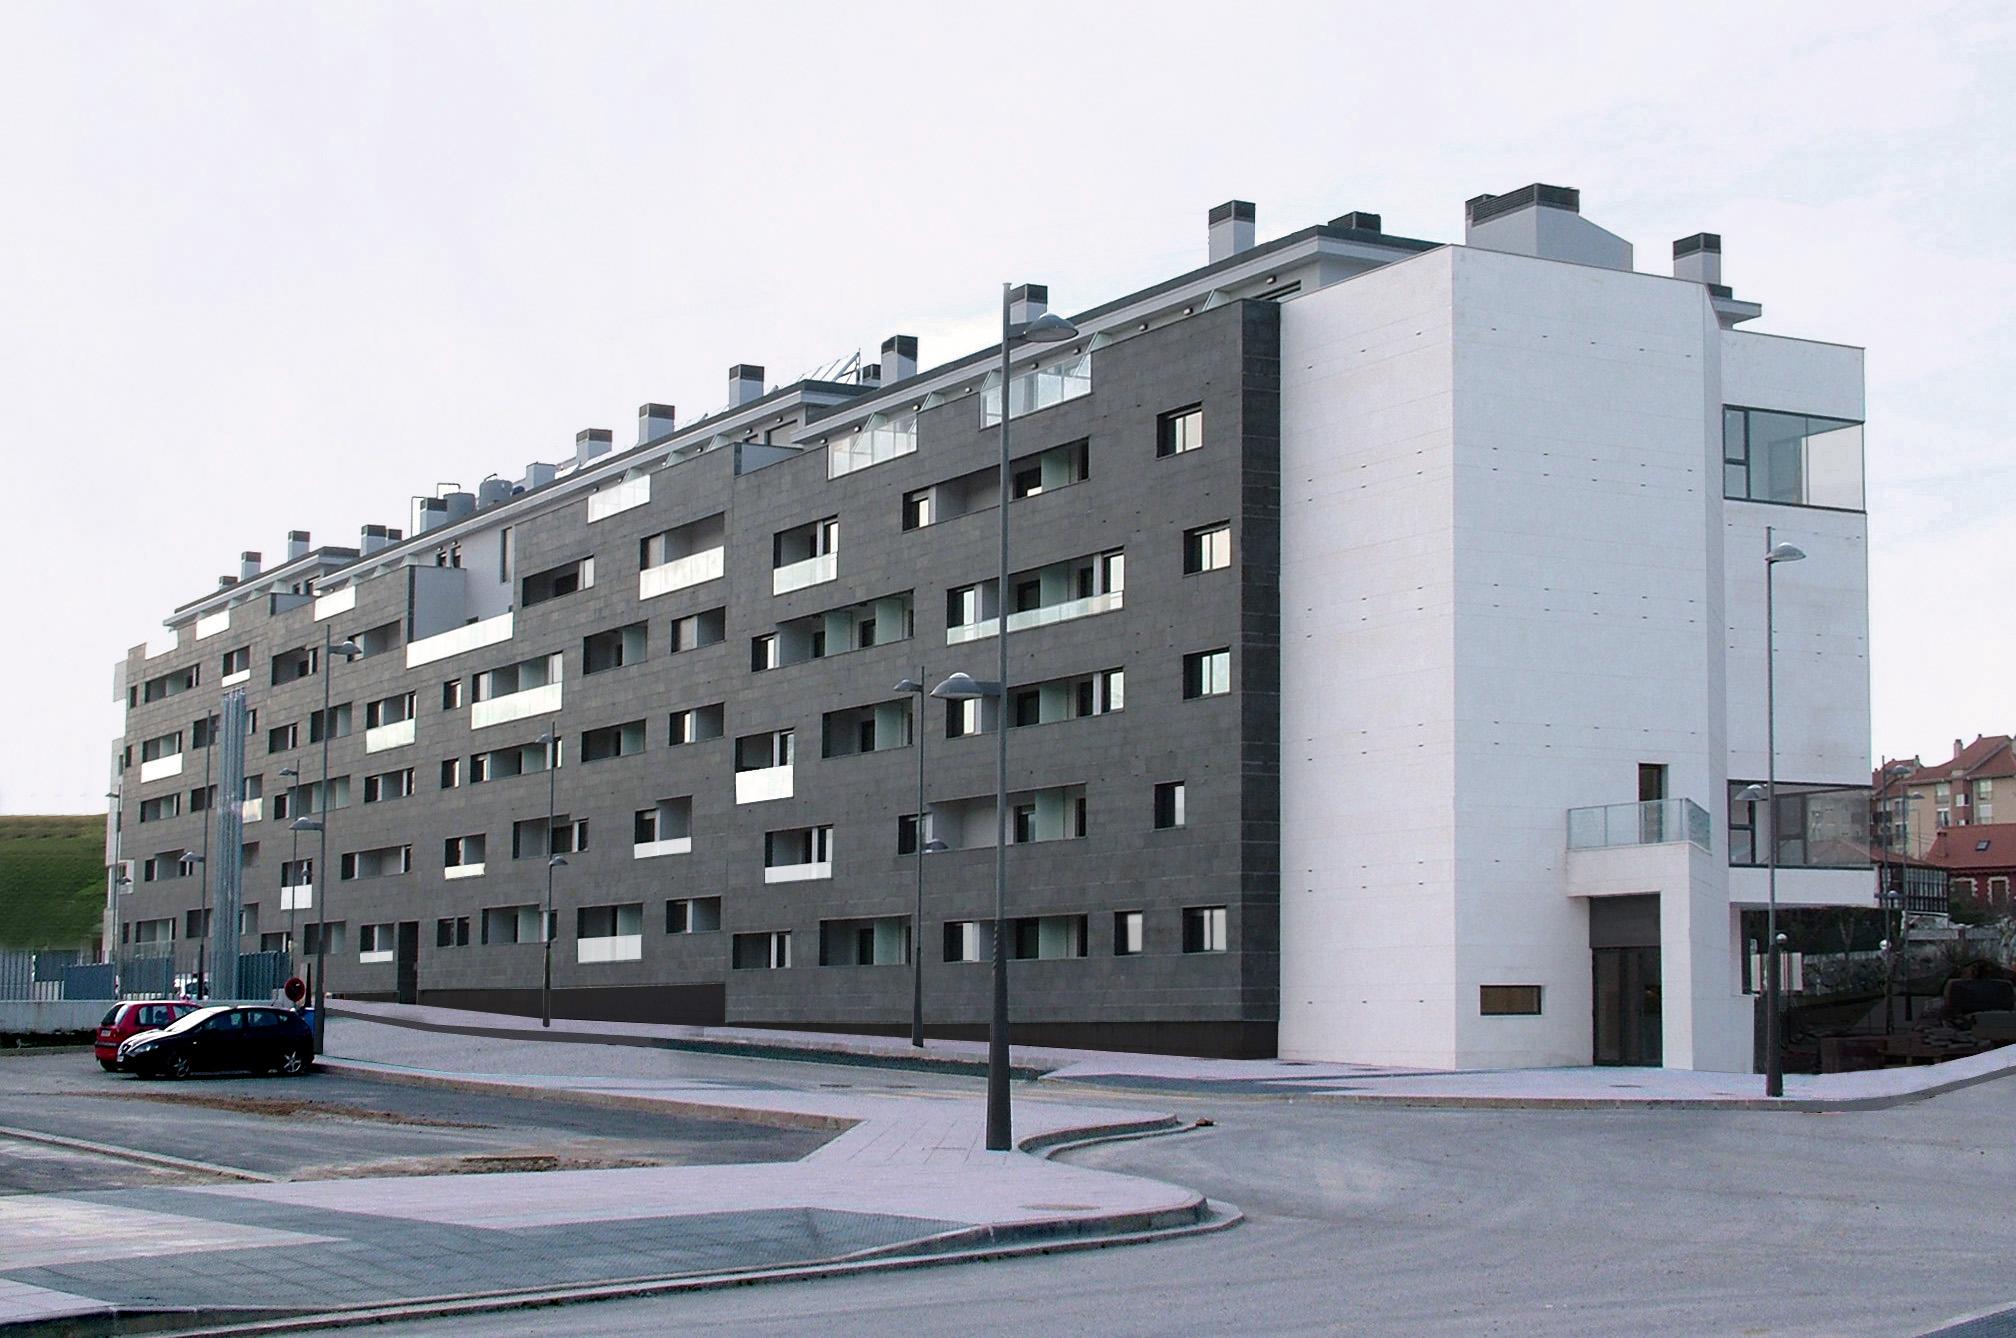 Vivienda de protecci n oficial wikipedia la - Fotos de viviendas ...